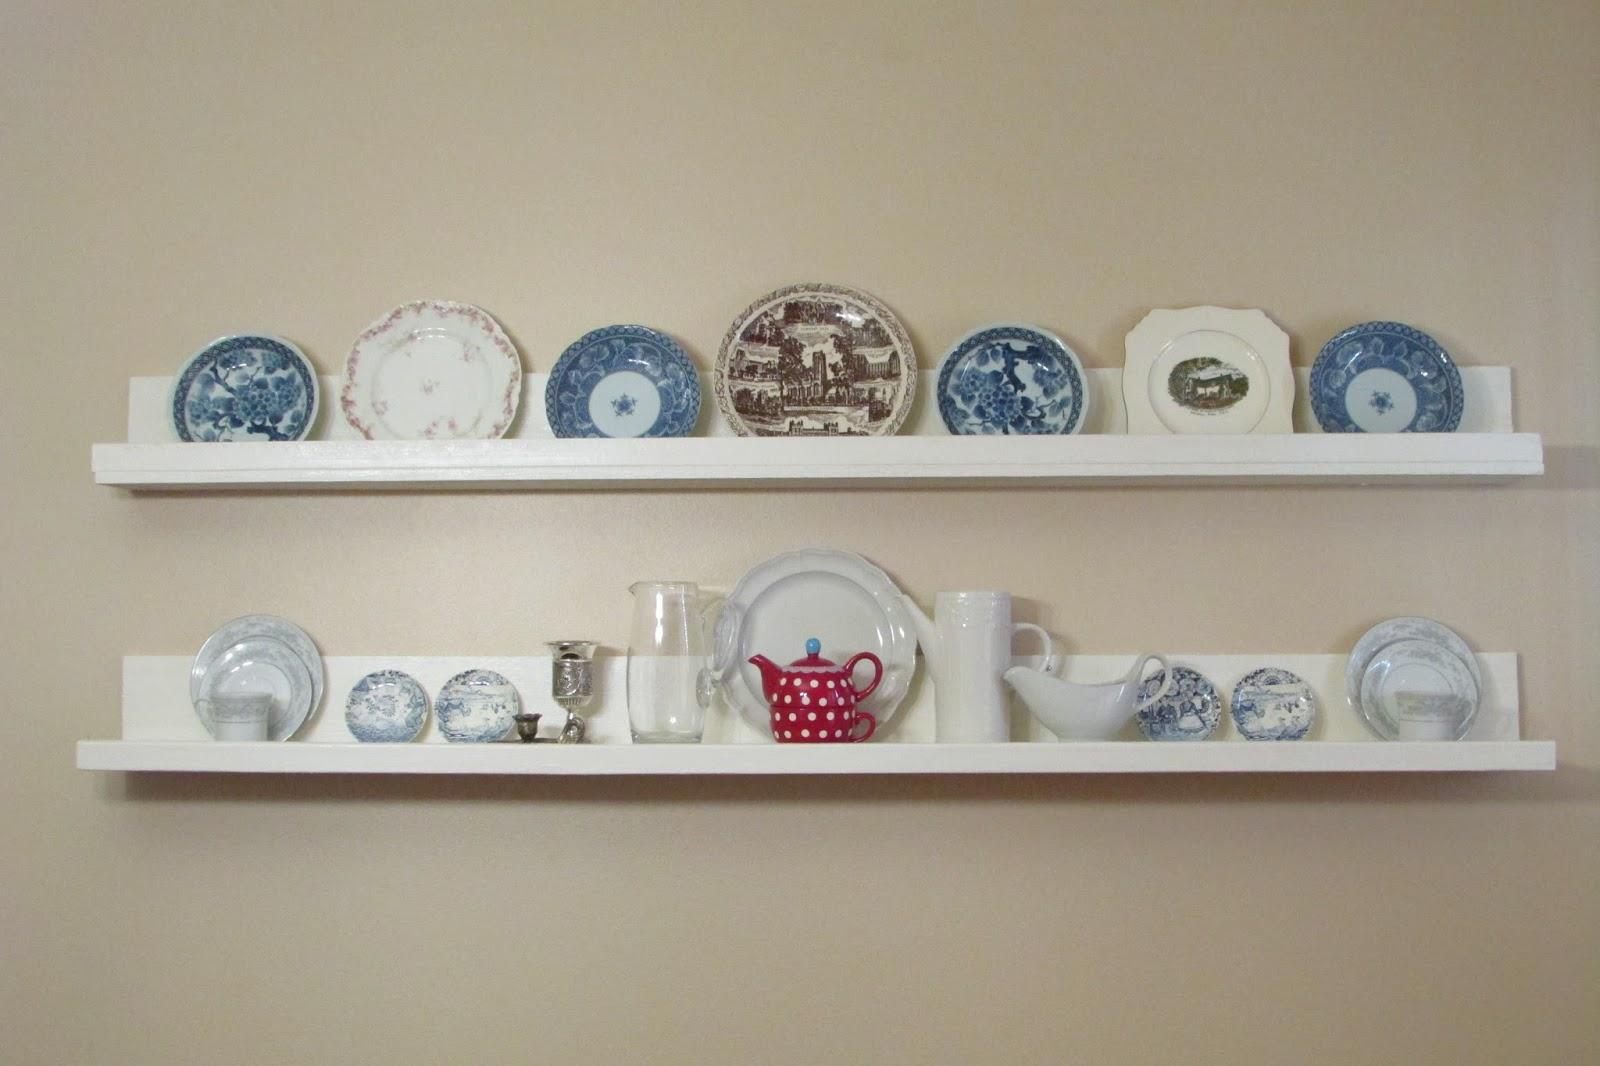 Diy Dining Room Shelves